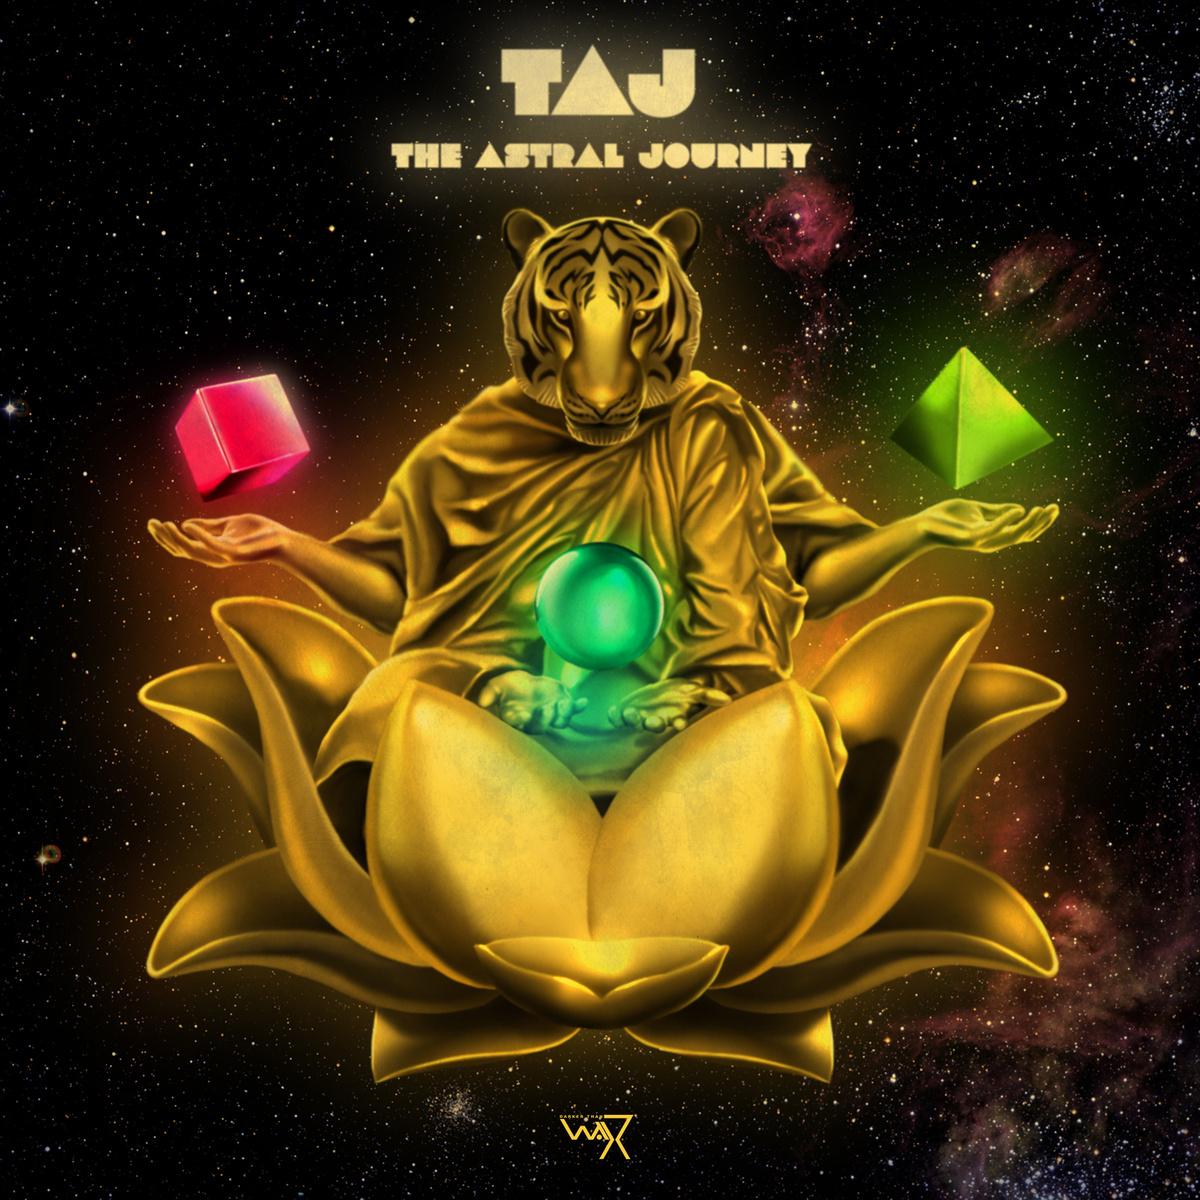 TAJ - The Astral Journey